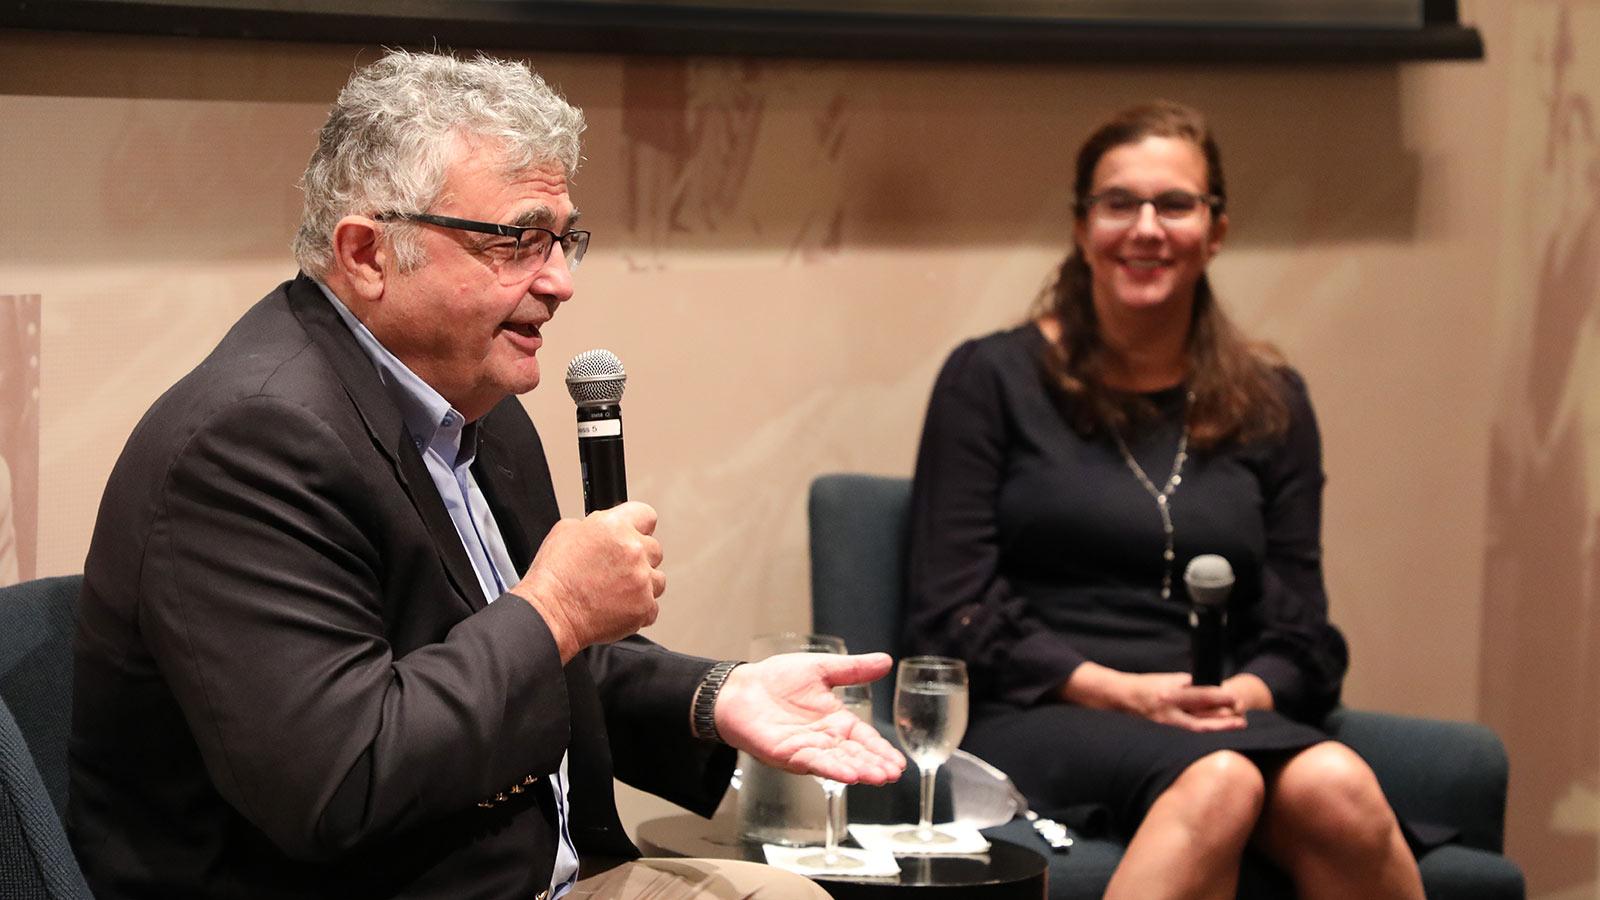 Historian Dr. Samuel Kassow and Professor Leah Garrett, Director of the Jewish Studies Center